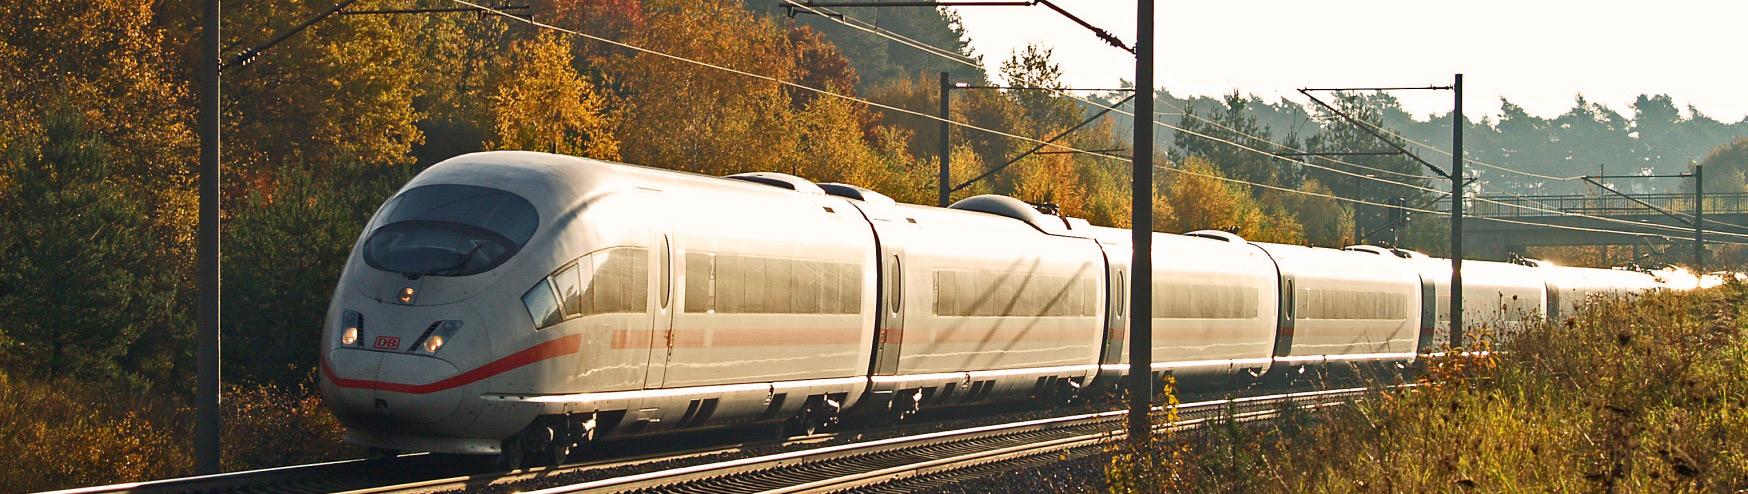 Deutsche Bahn AG / Claus Weber